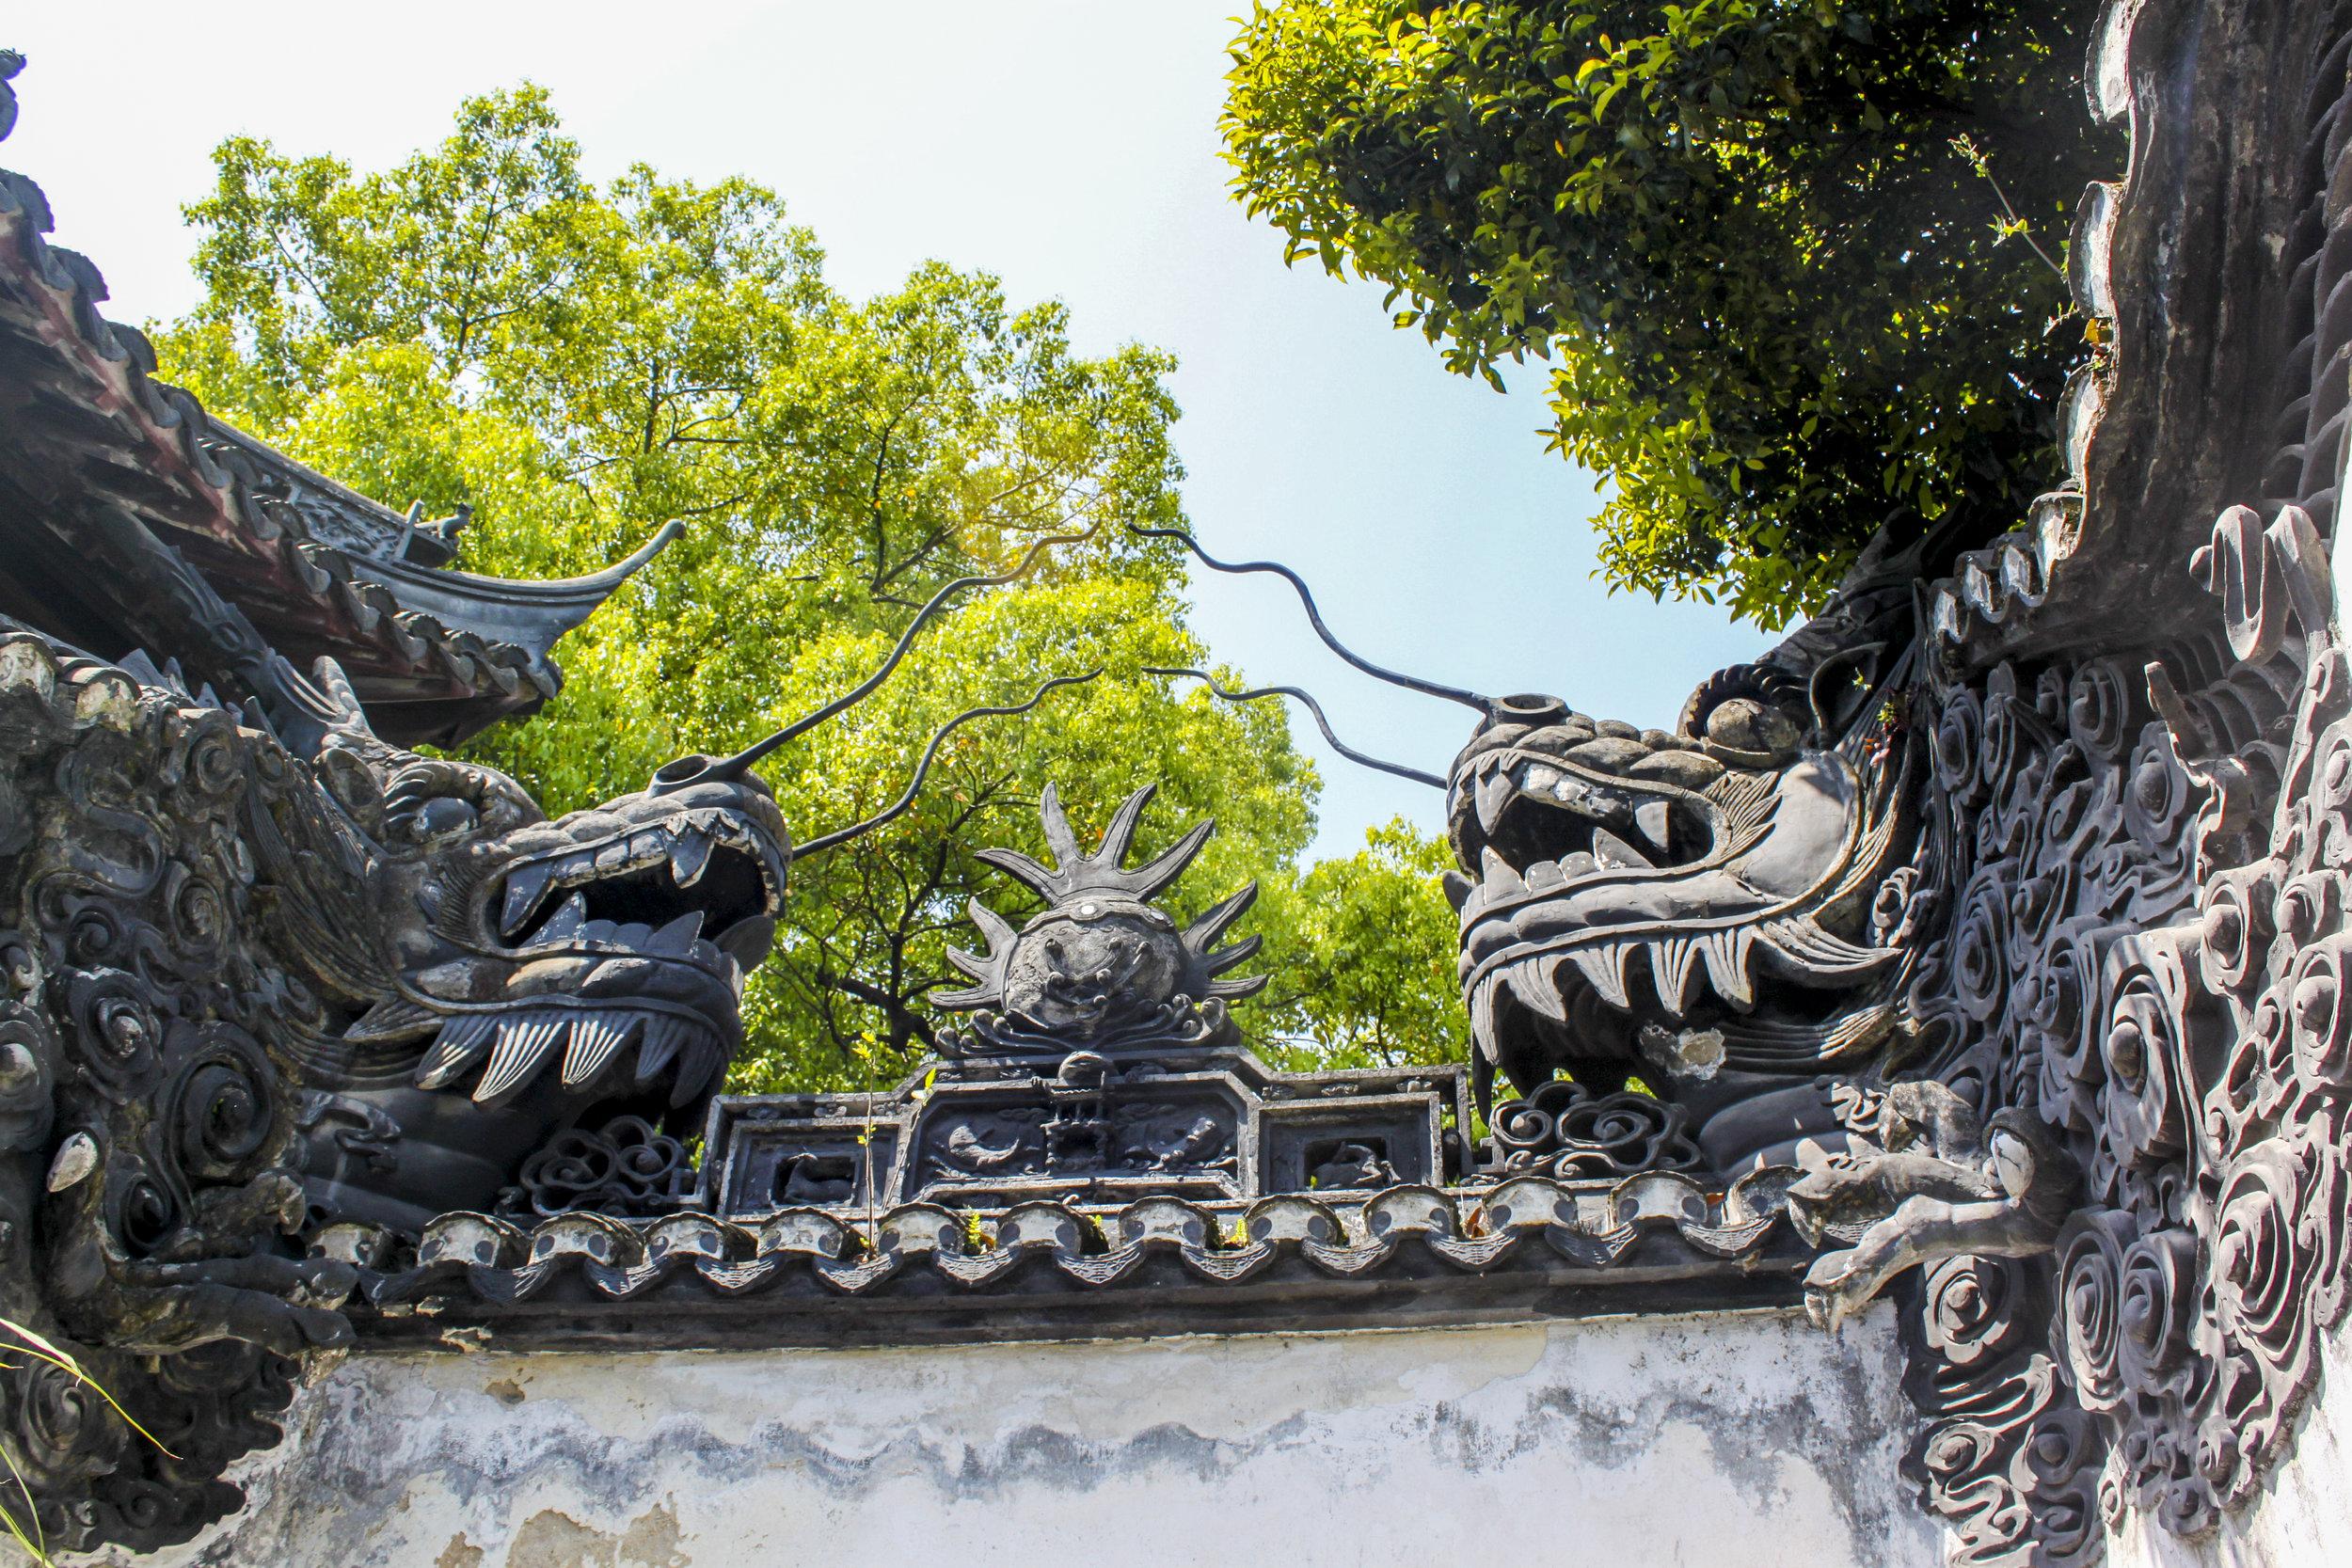 tailor-made-shanghai-sightseeing-tour-yu-garden